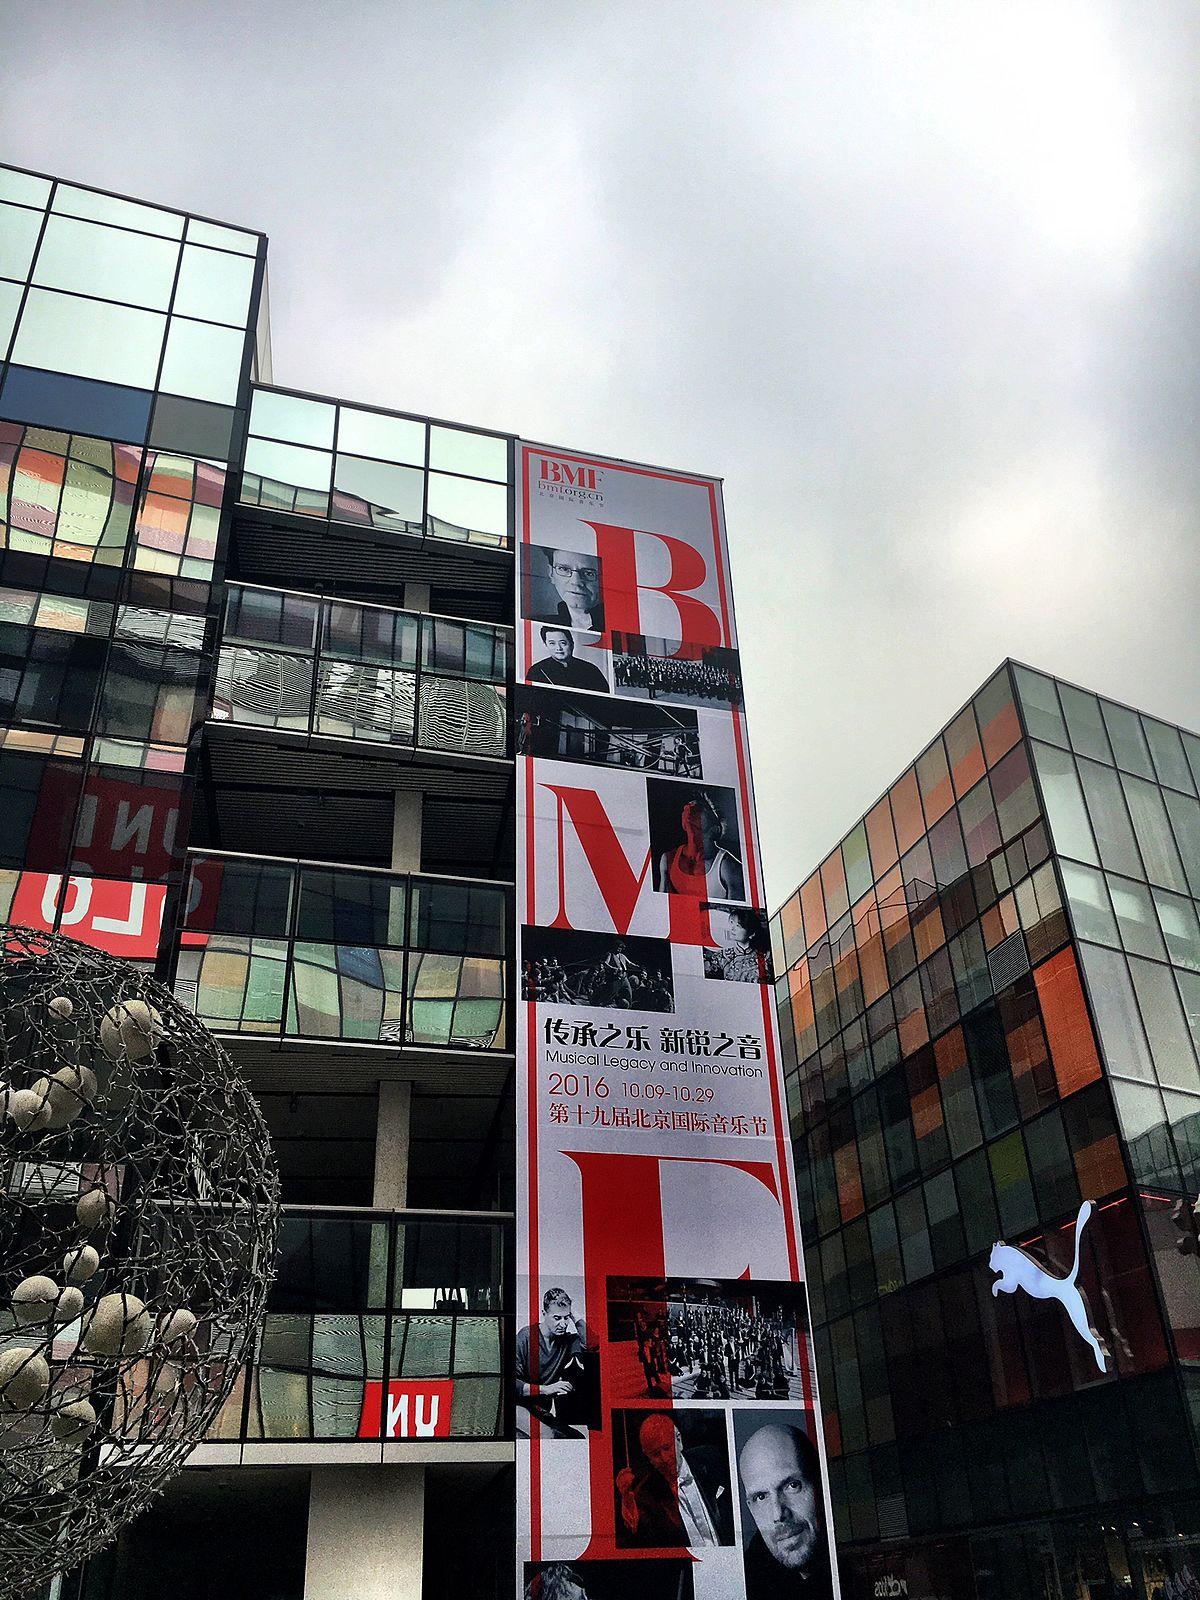 Fete De La Musique 2016 Nancy : musique, nancy, Beijing, Music, Festival, Wikipedia